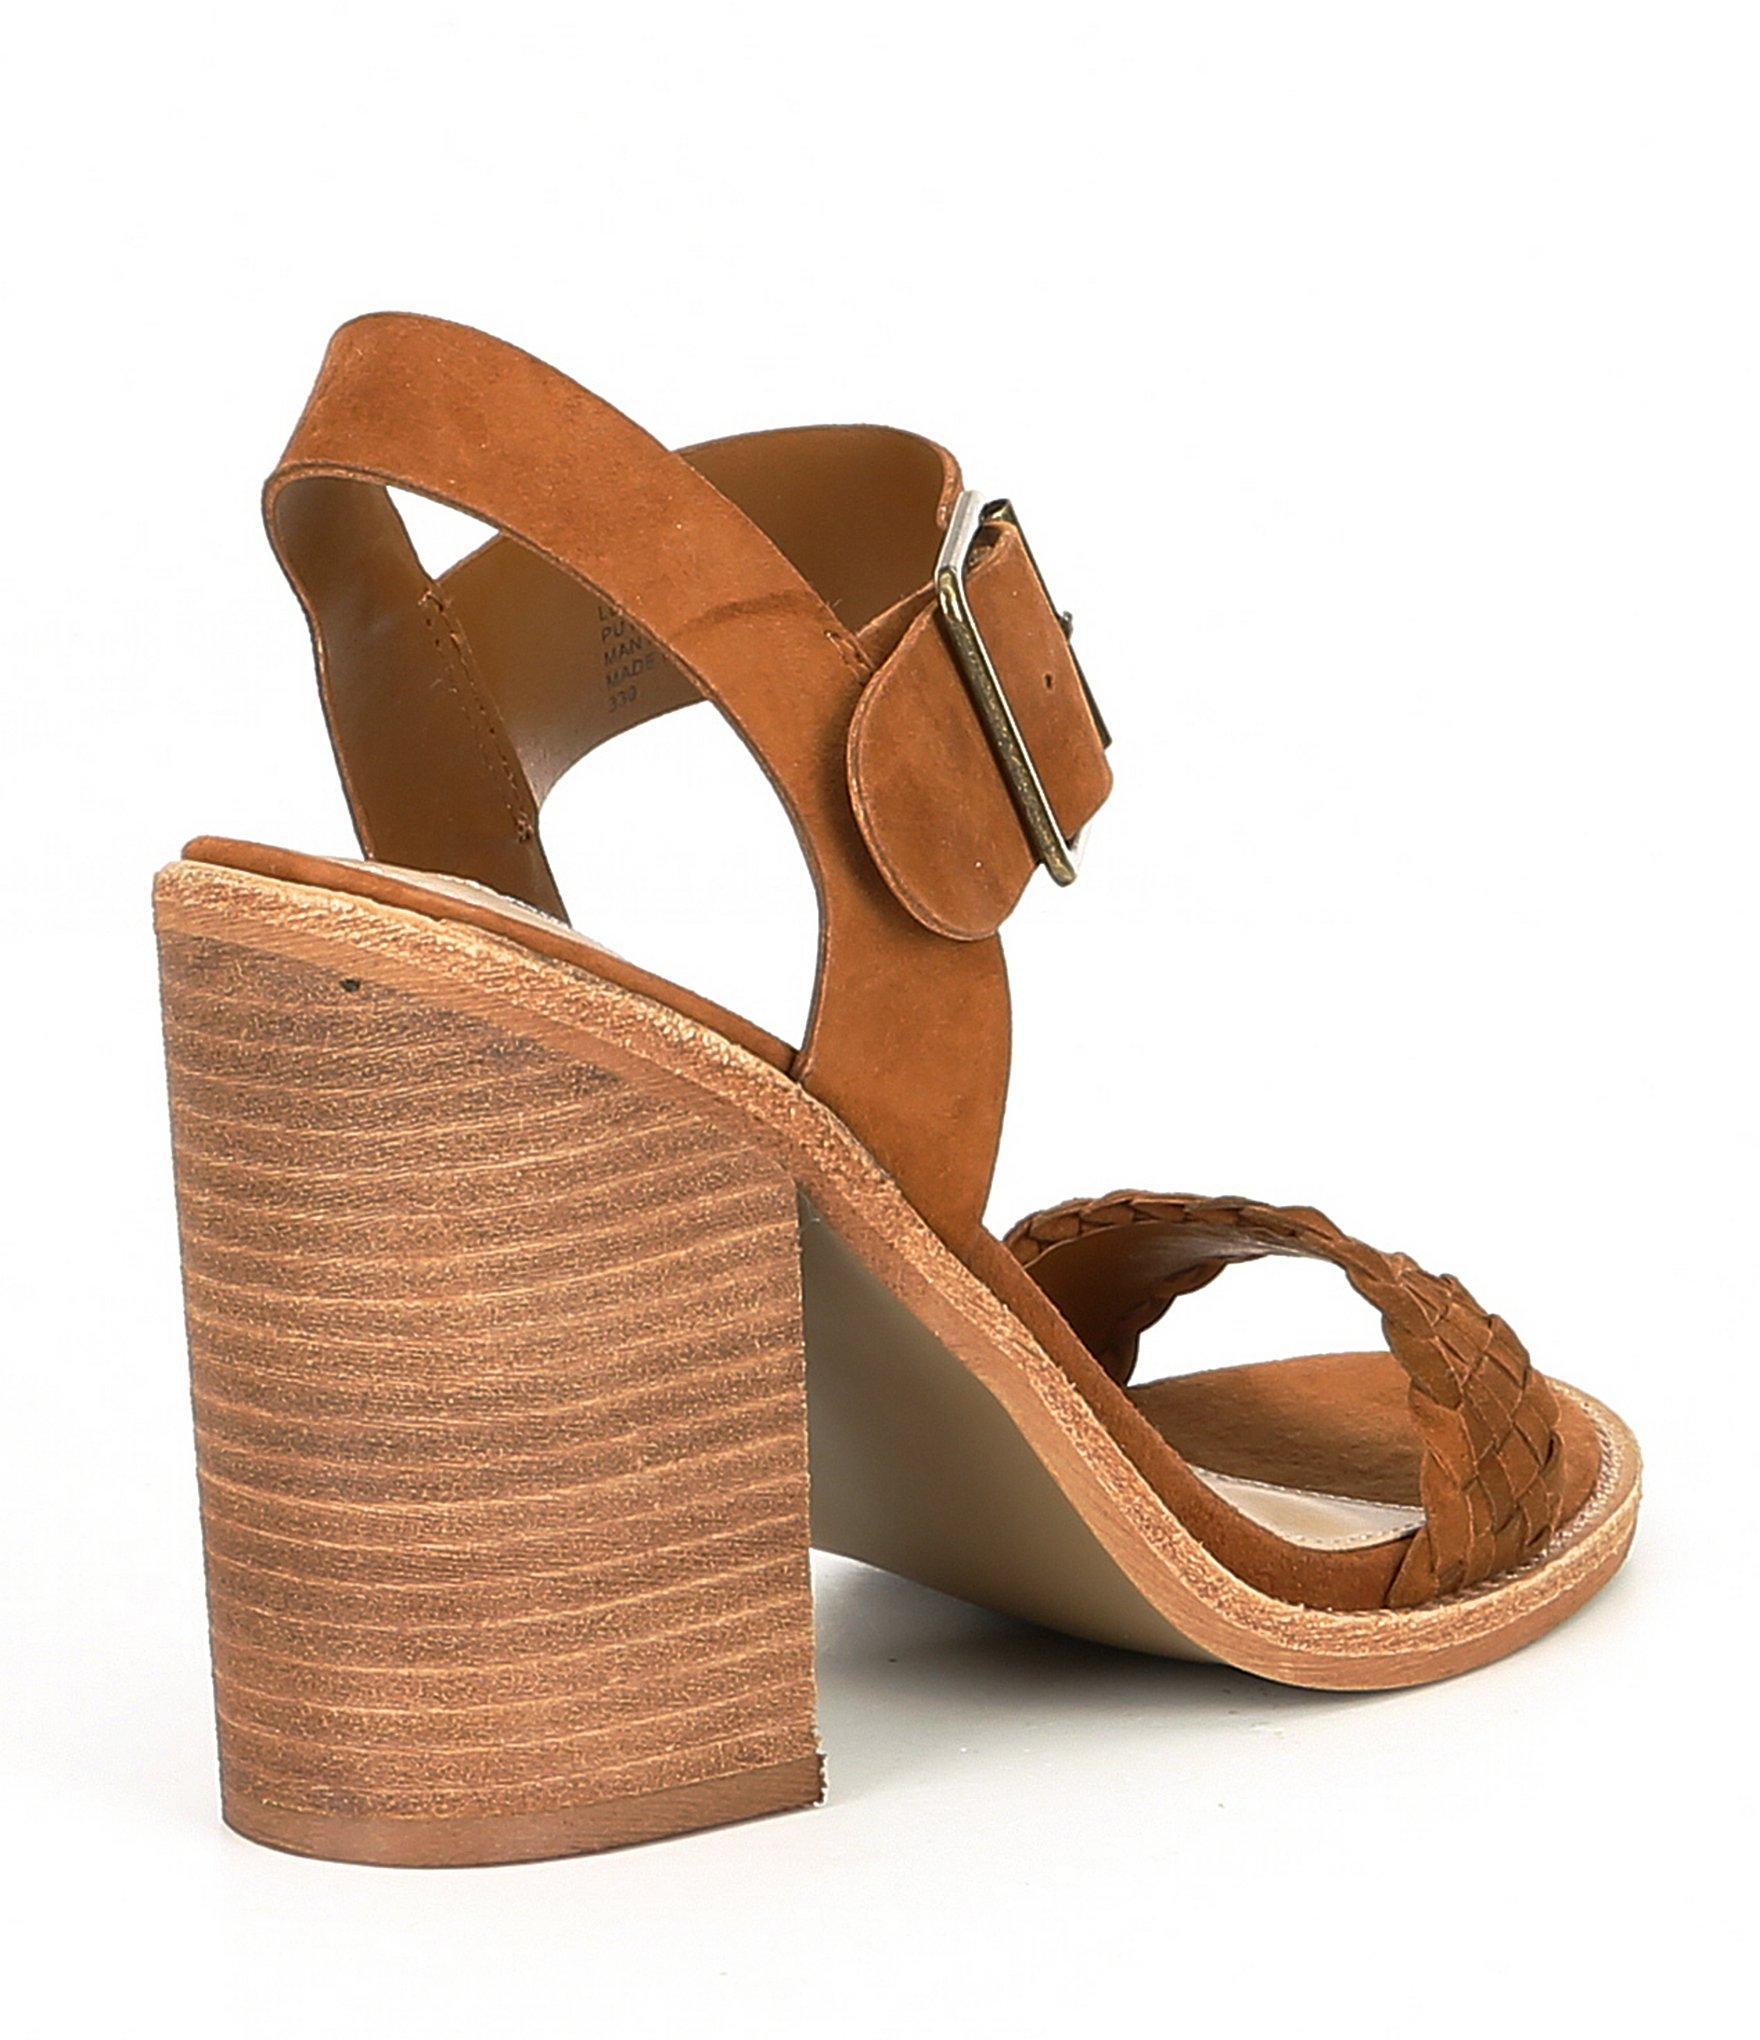 b769630b1c1 Steve Madden - Brown Cadence Suede Block-heel Sandals - Lyst. View  fullscreen